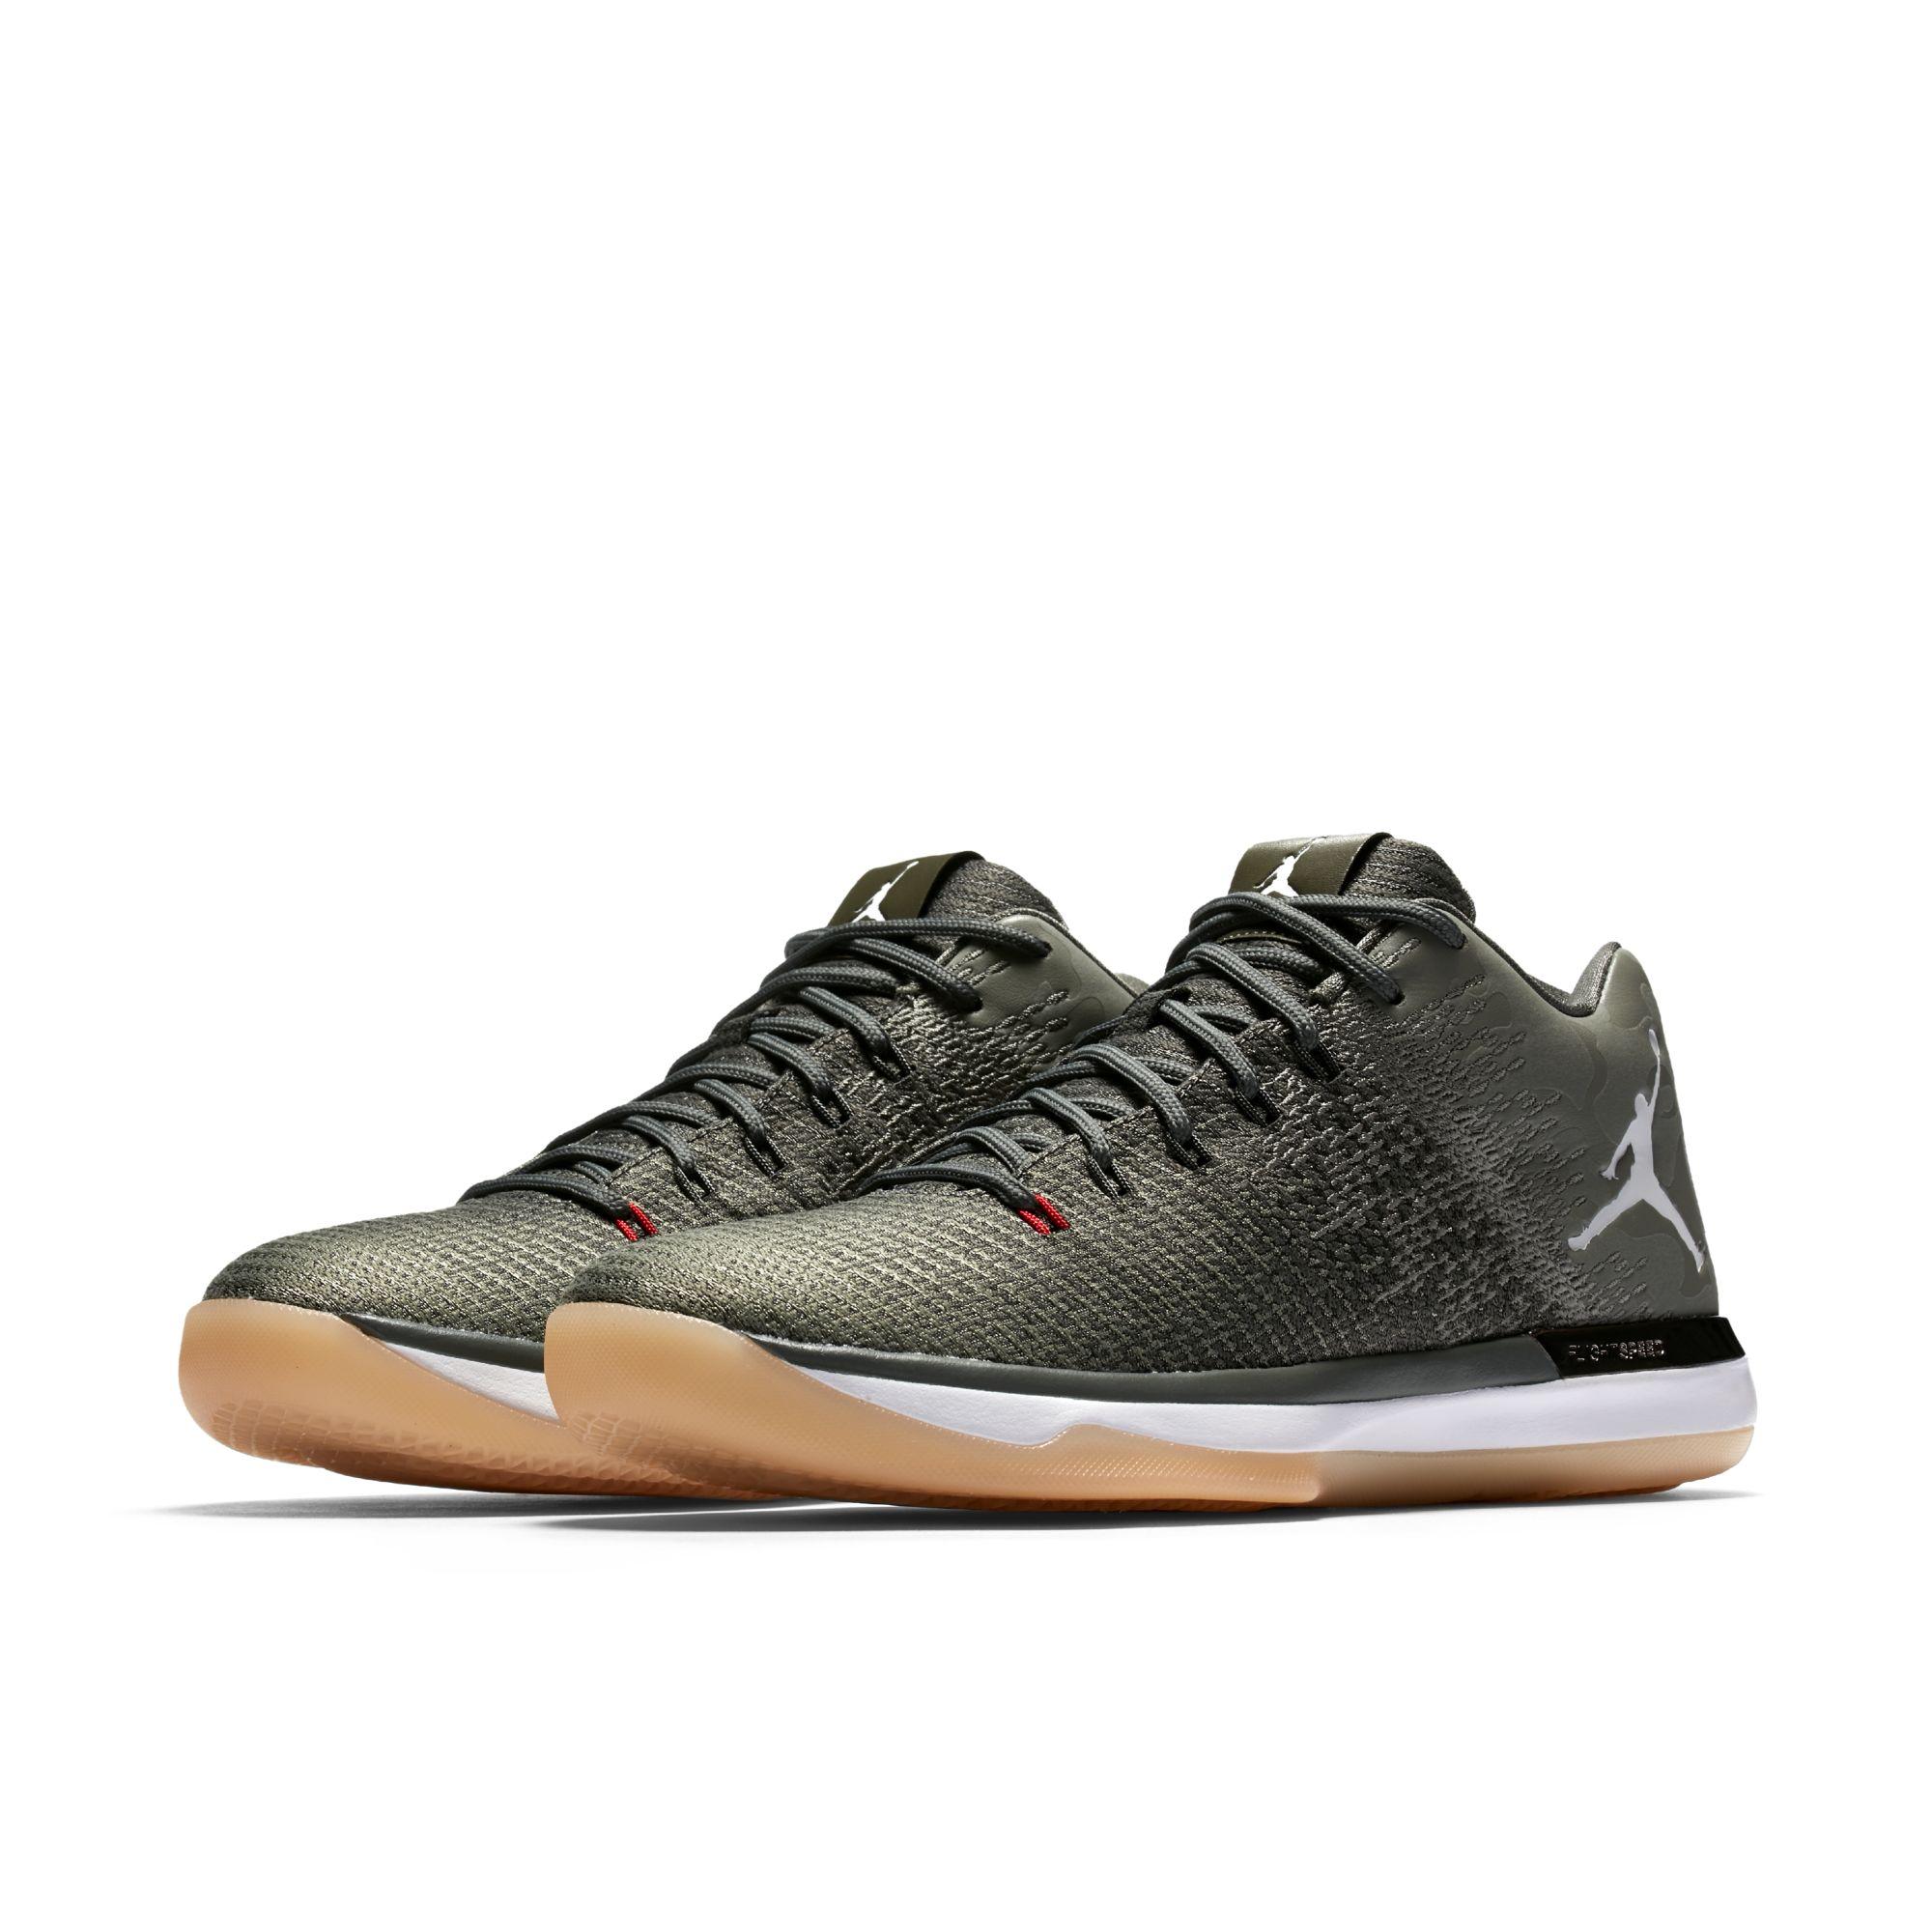 Air Jordan XXXI Low